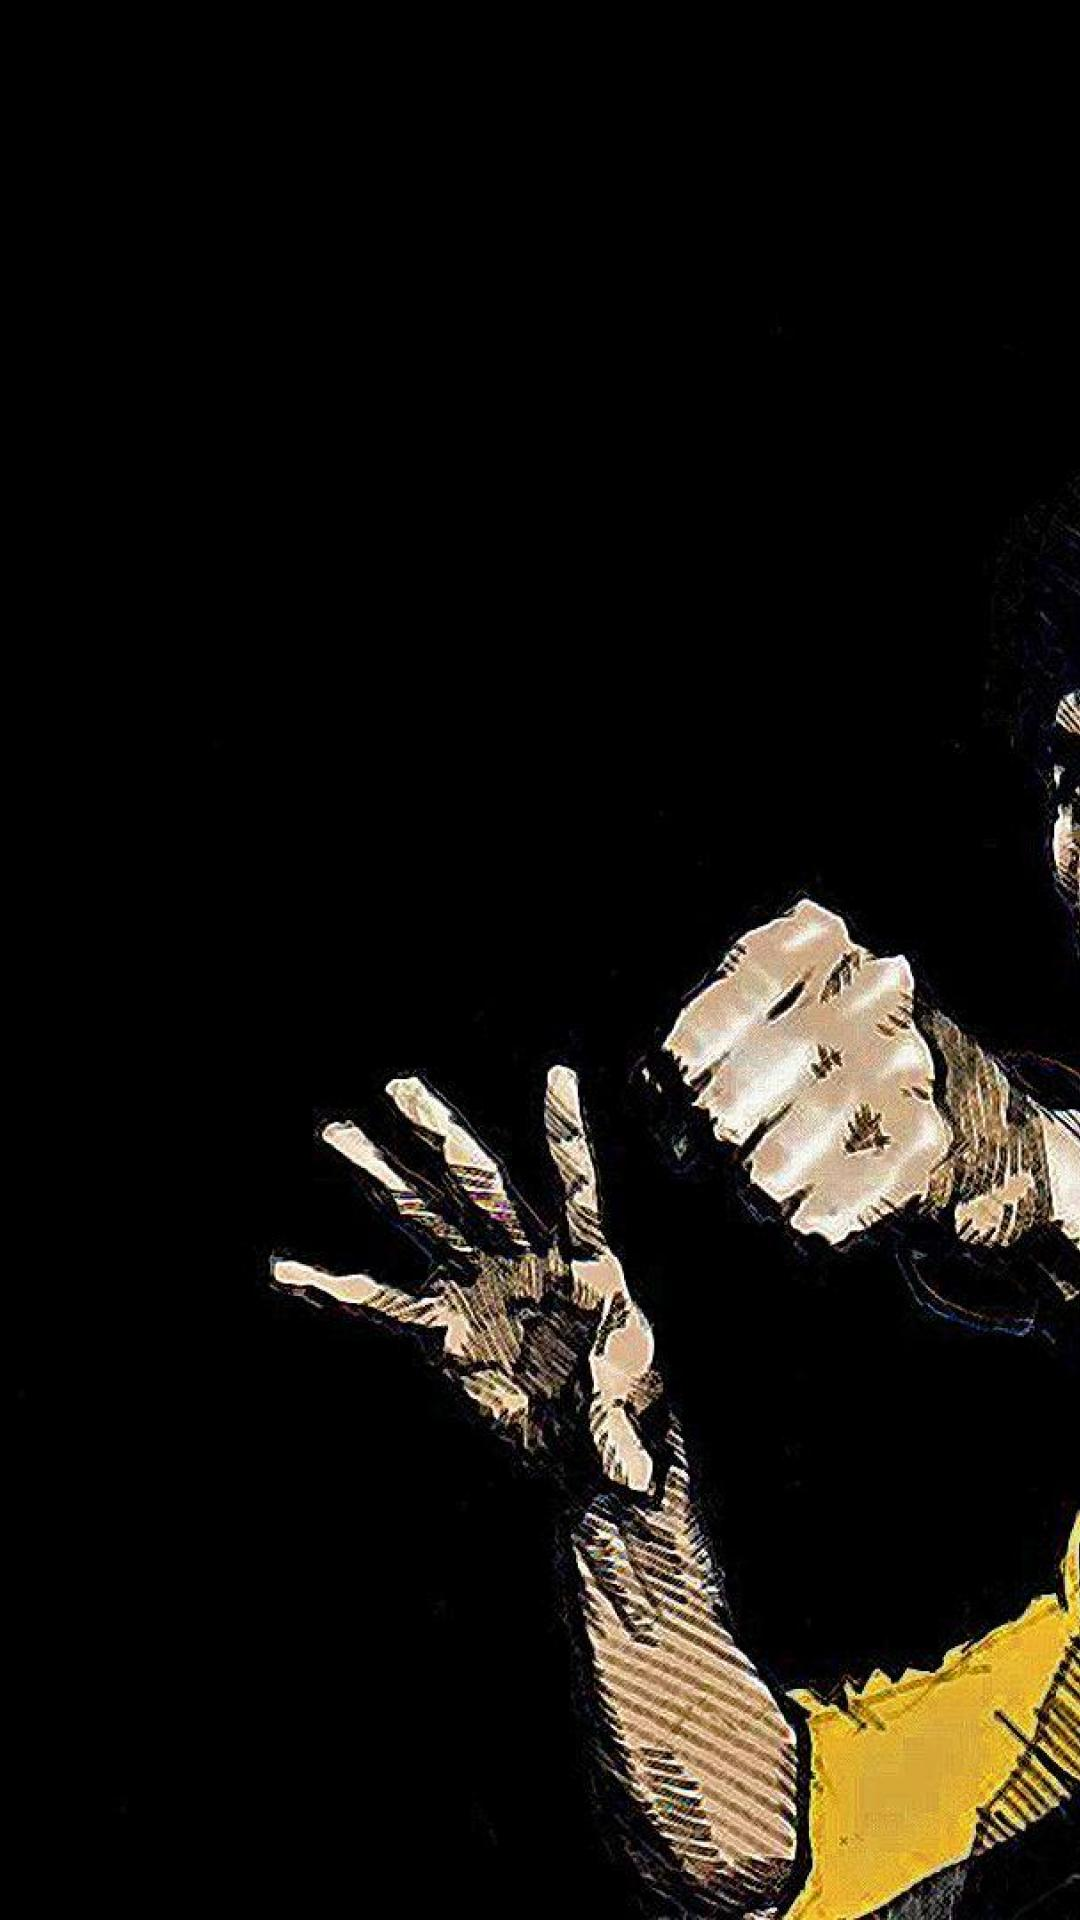 Bruce Lee Quotes Wallpaper Hd Bruce Lee Iphone Wallpaper Pixelstalk Net